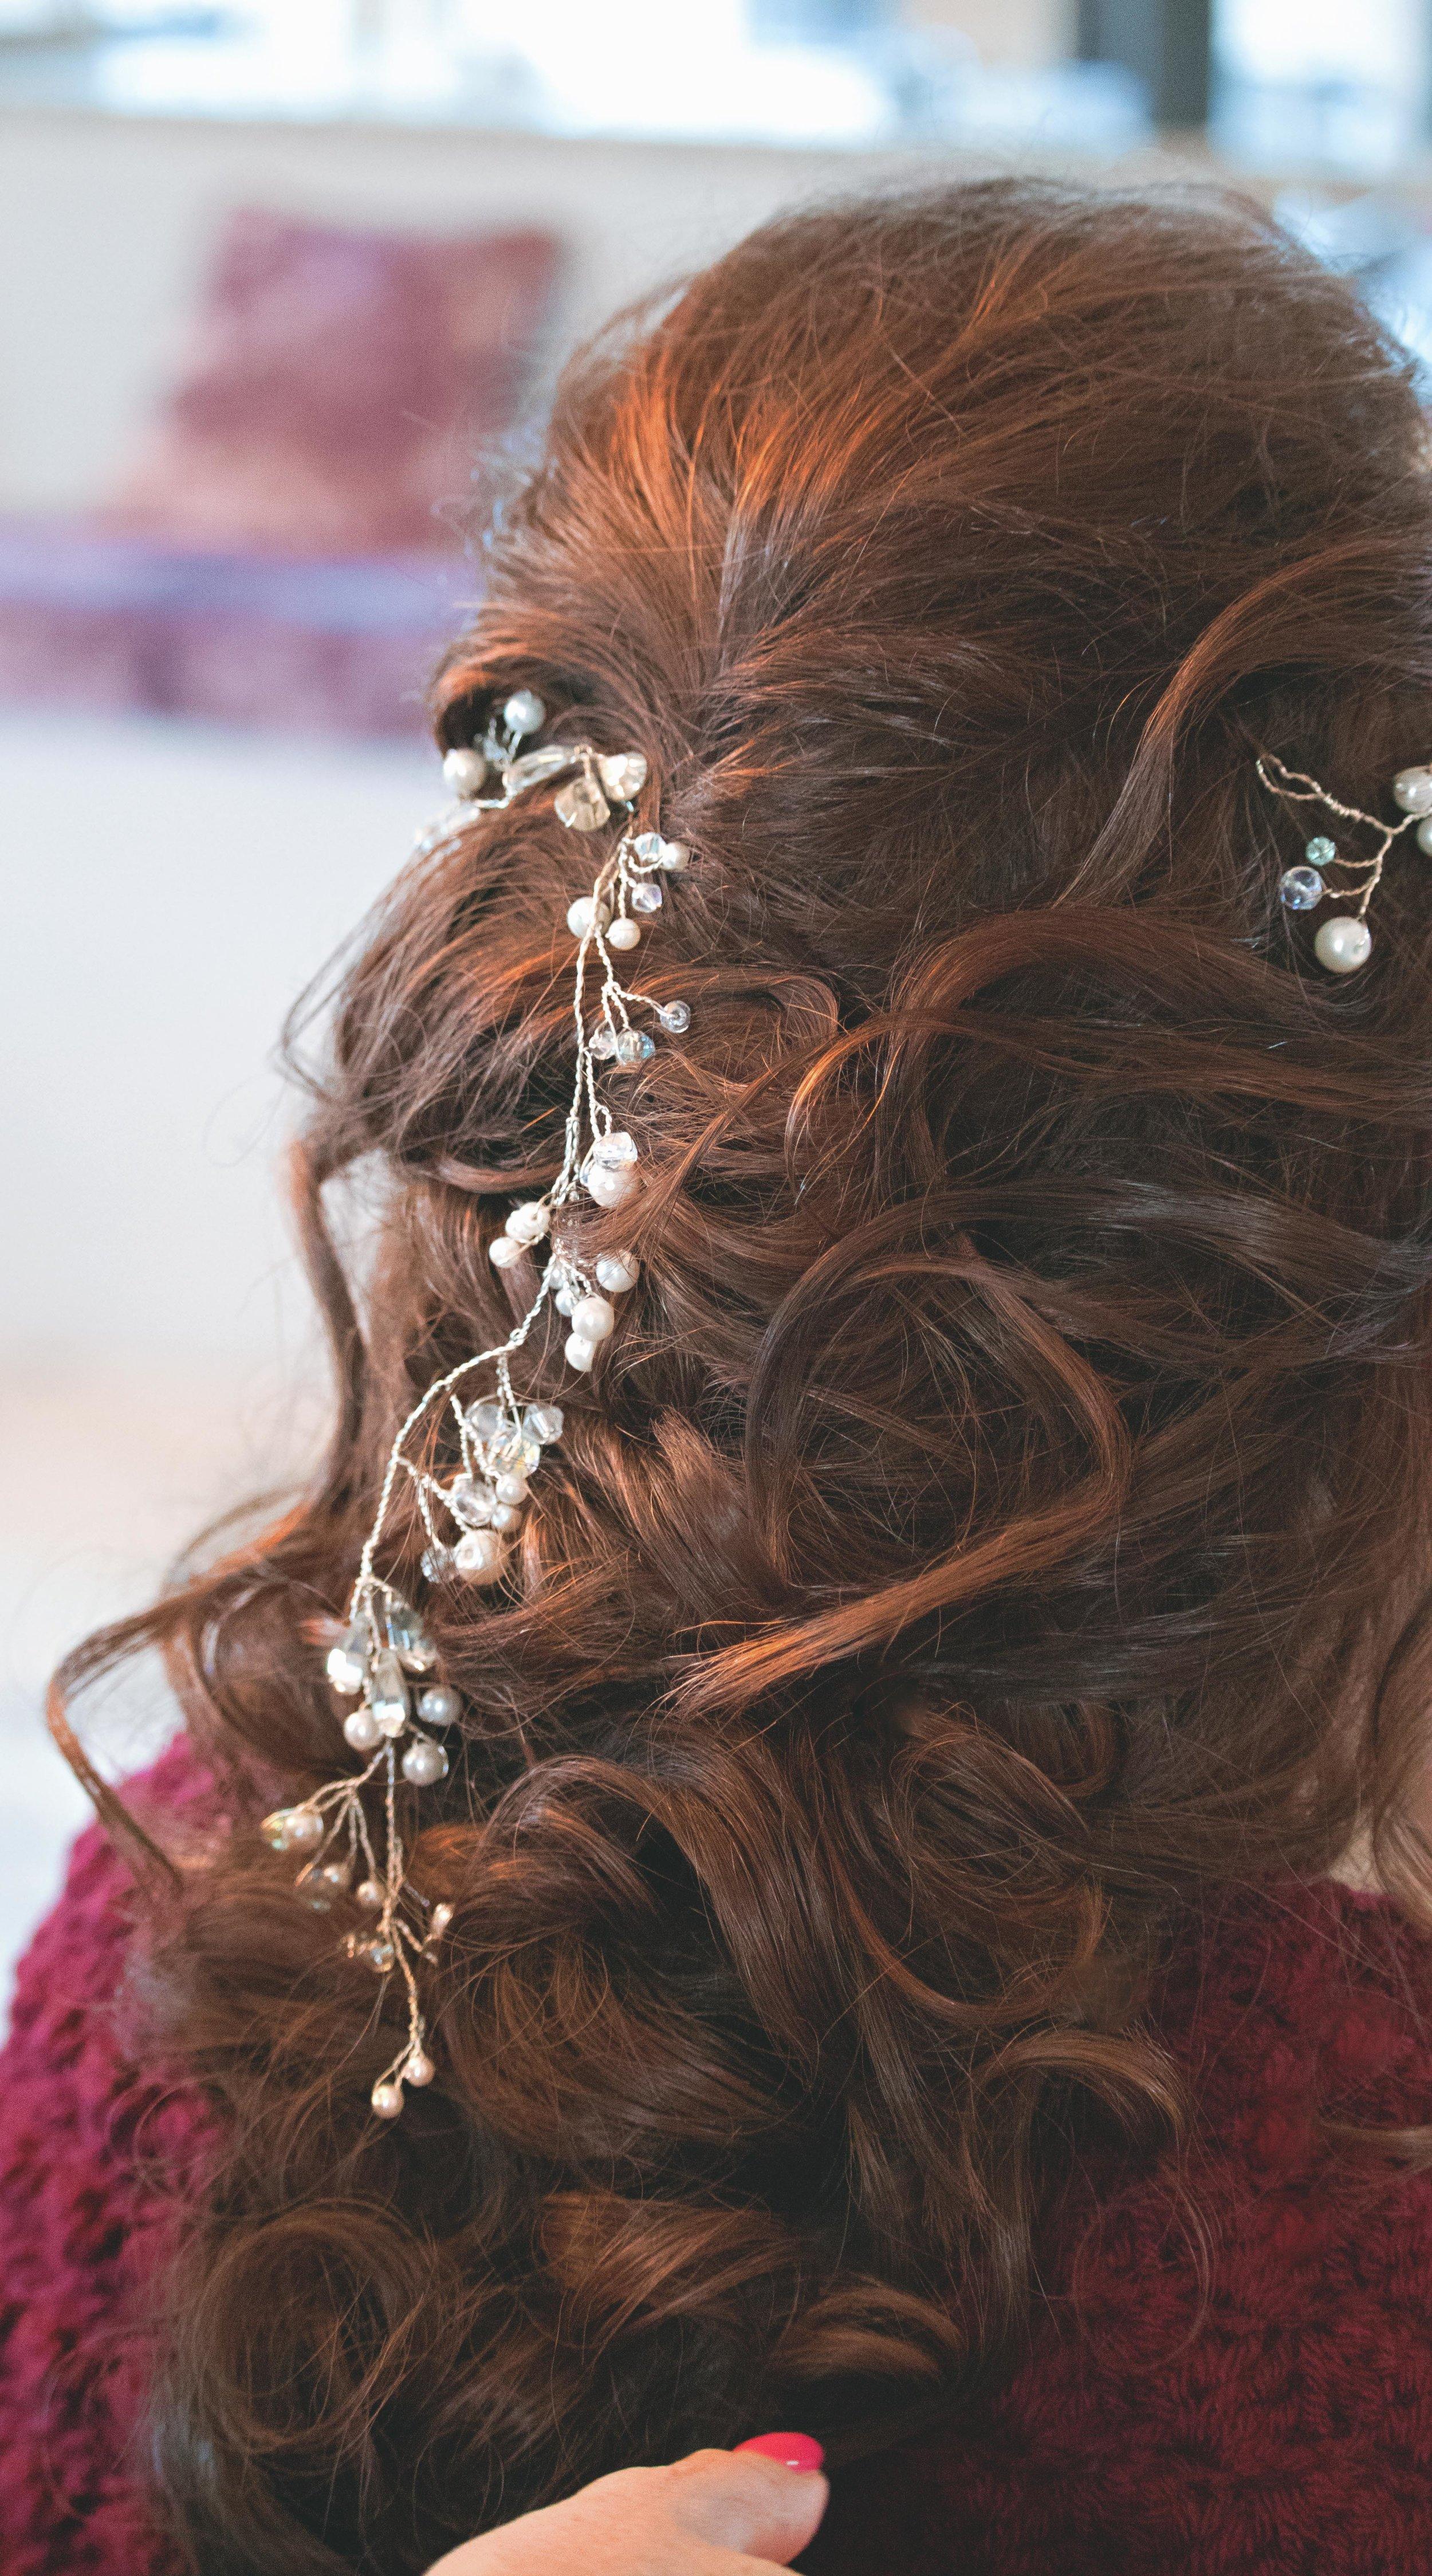 bridal hairstyle curls braid long hair.jpg